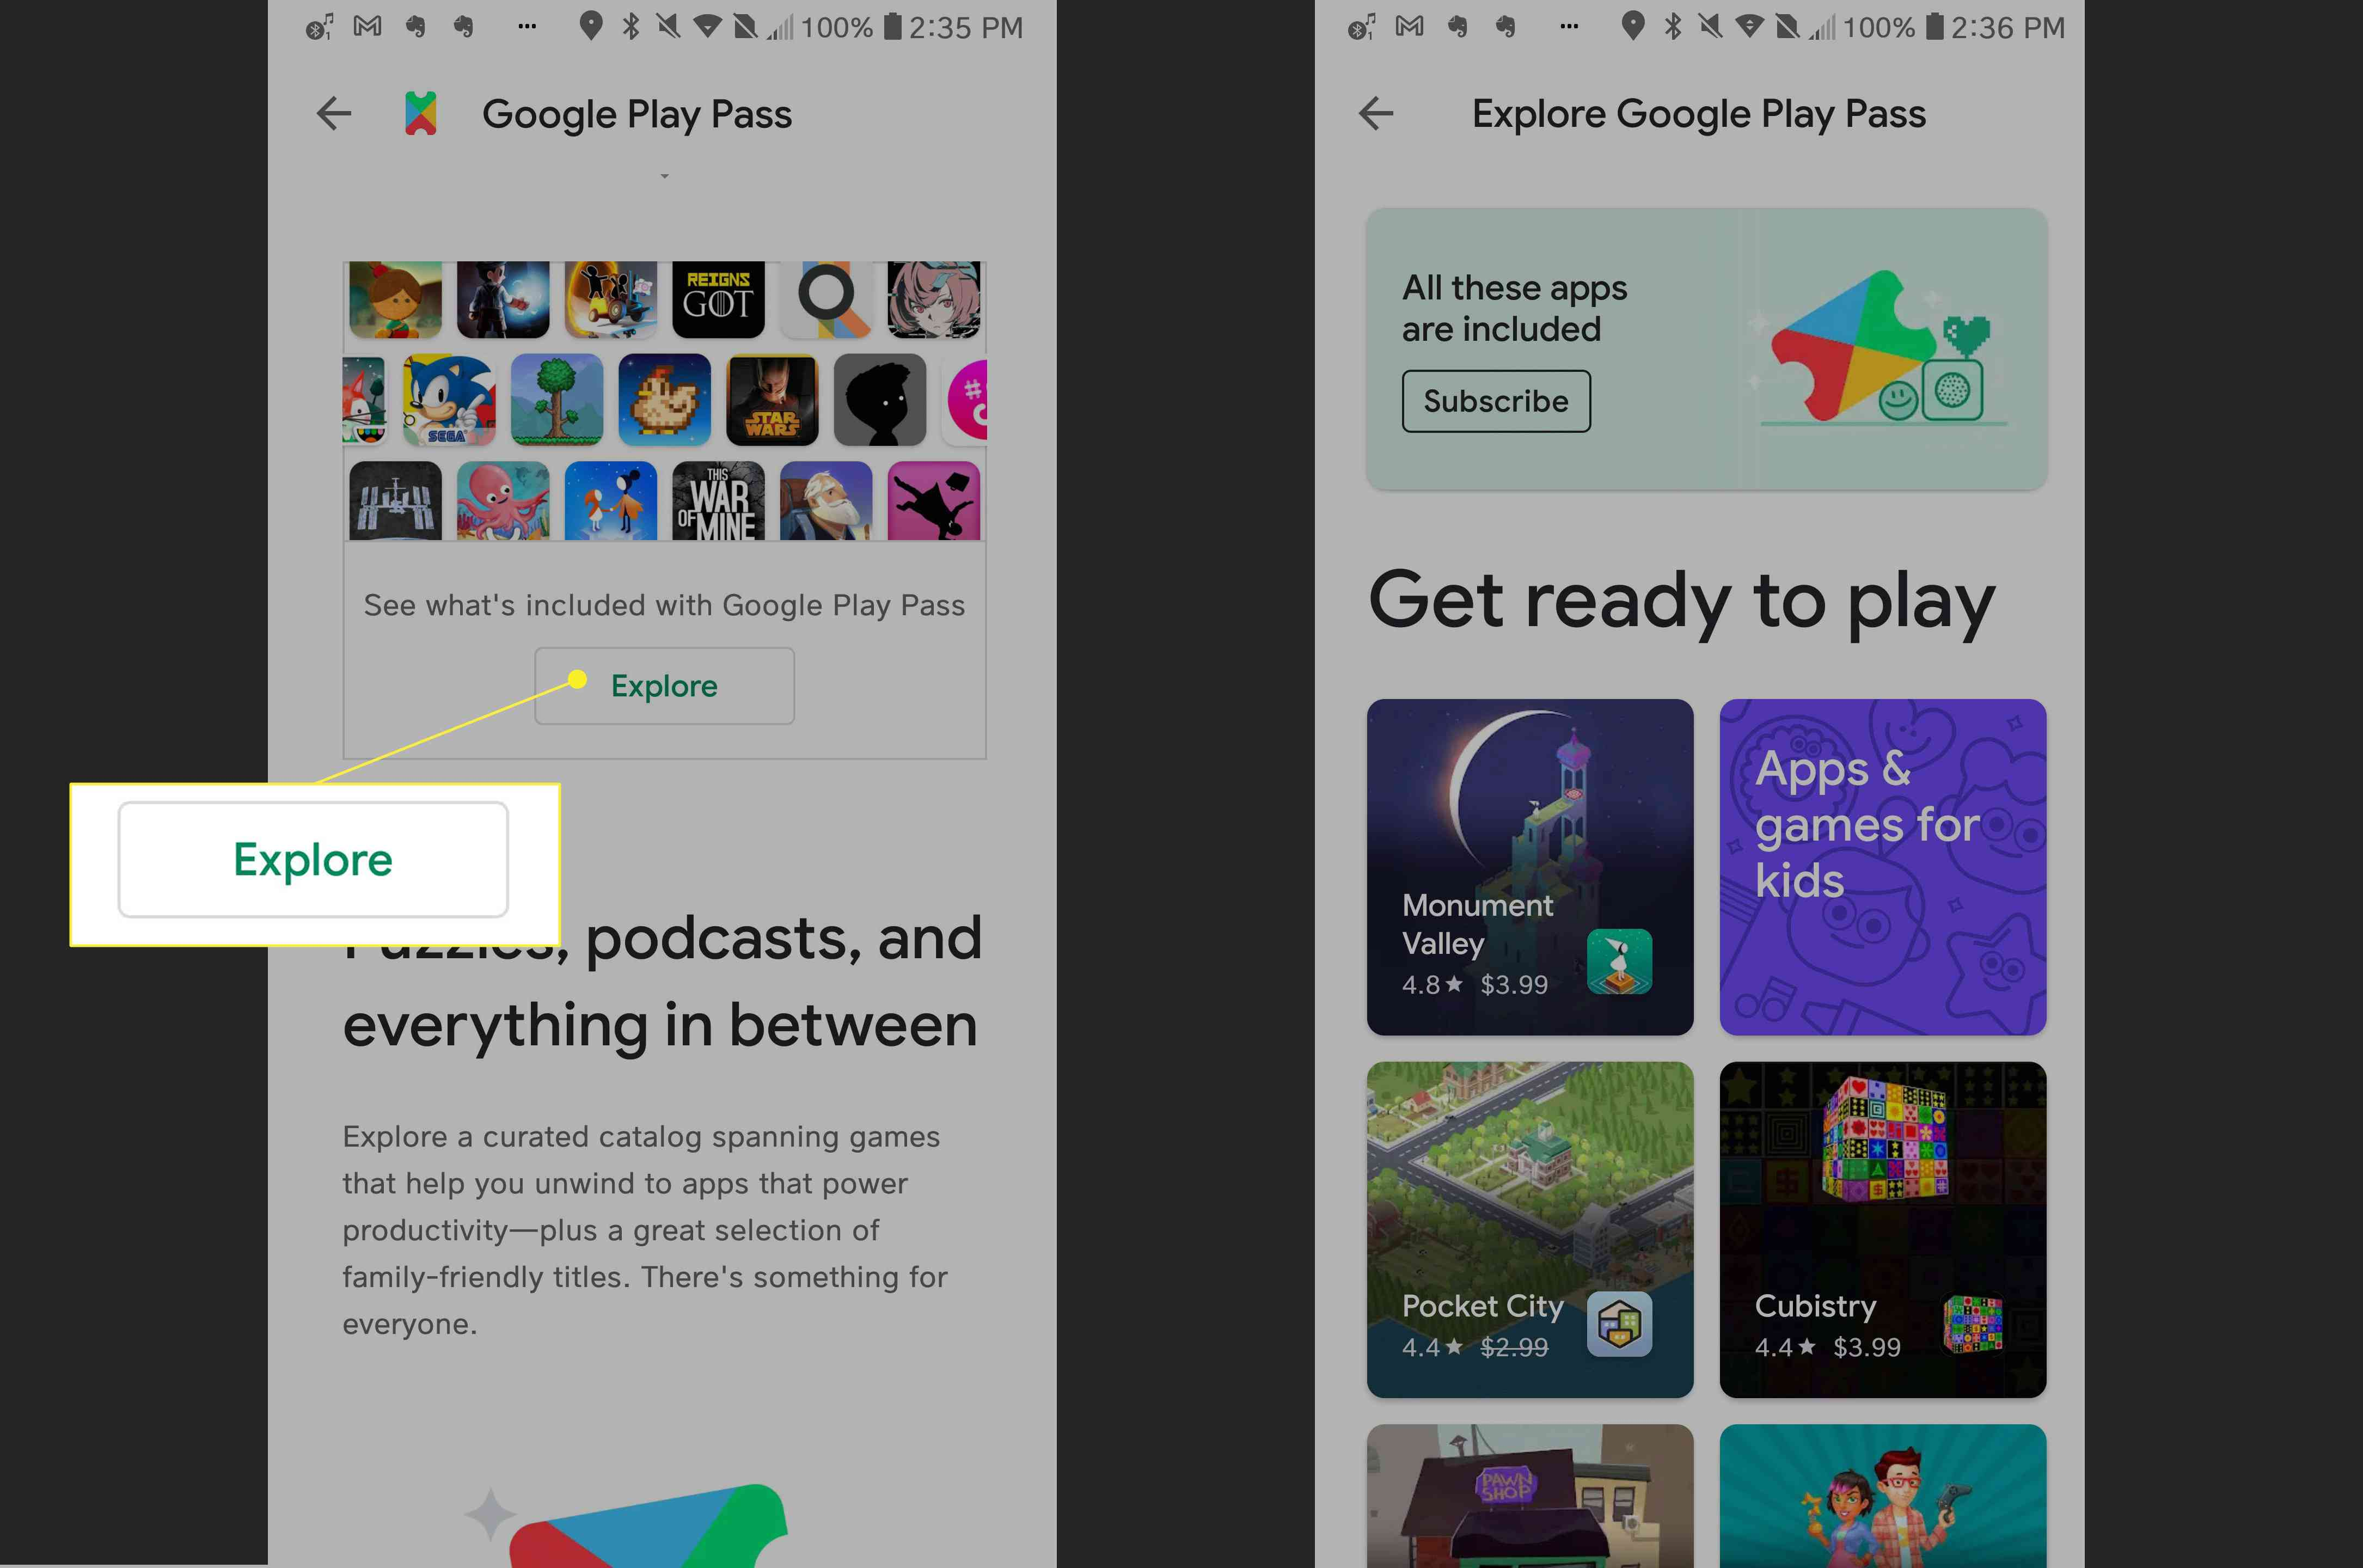 Google Play Pass > Explore